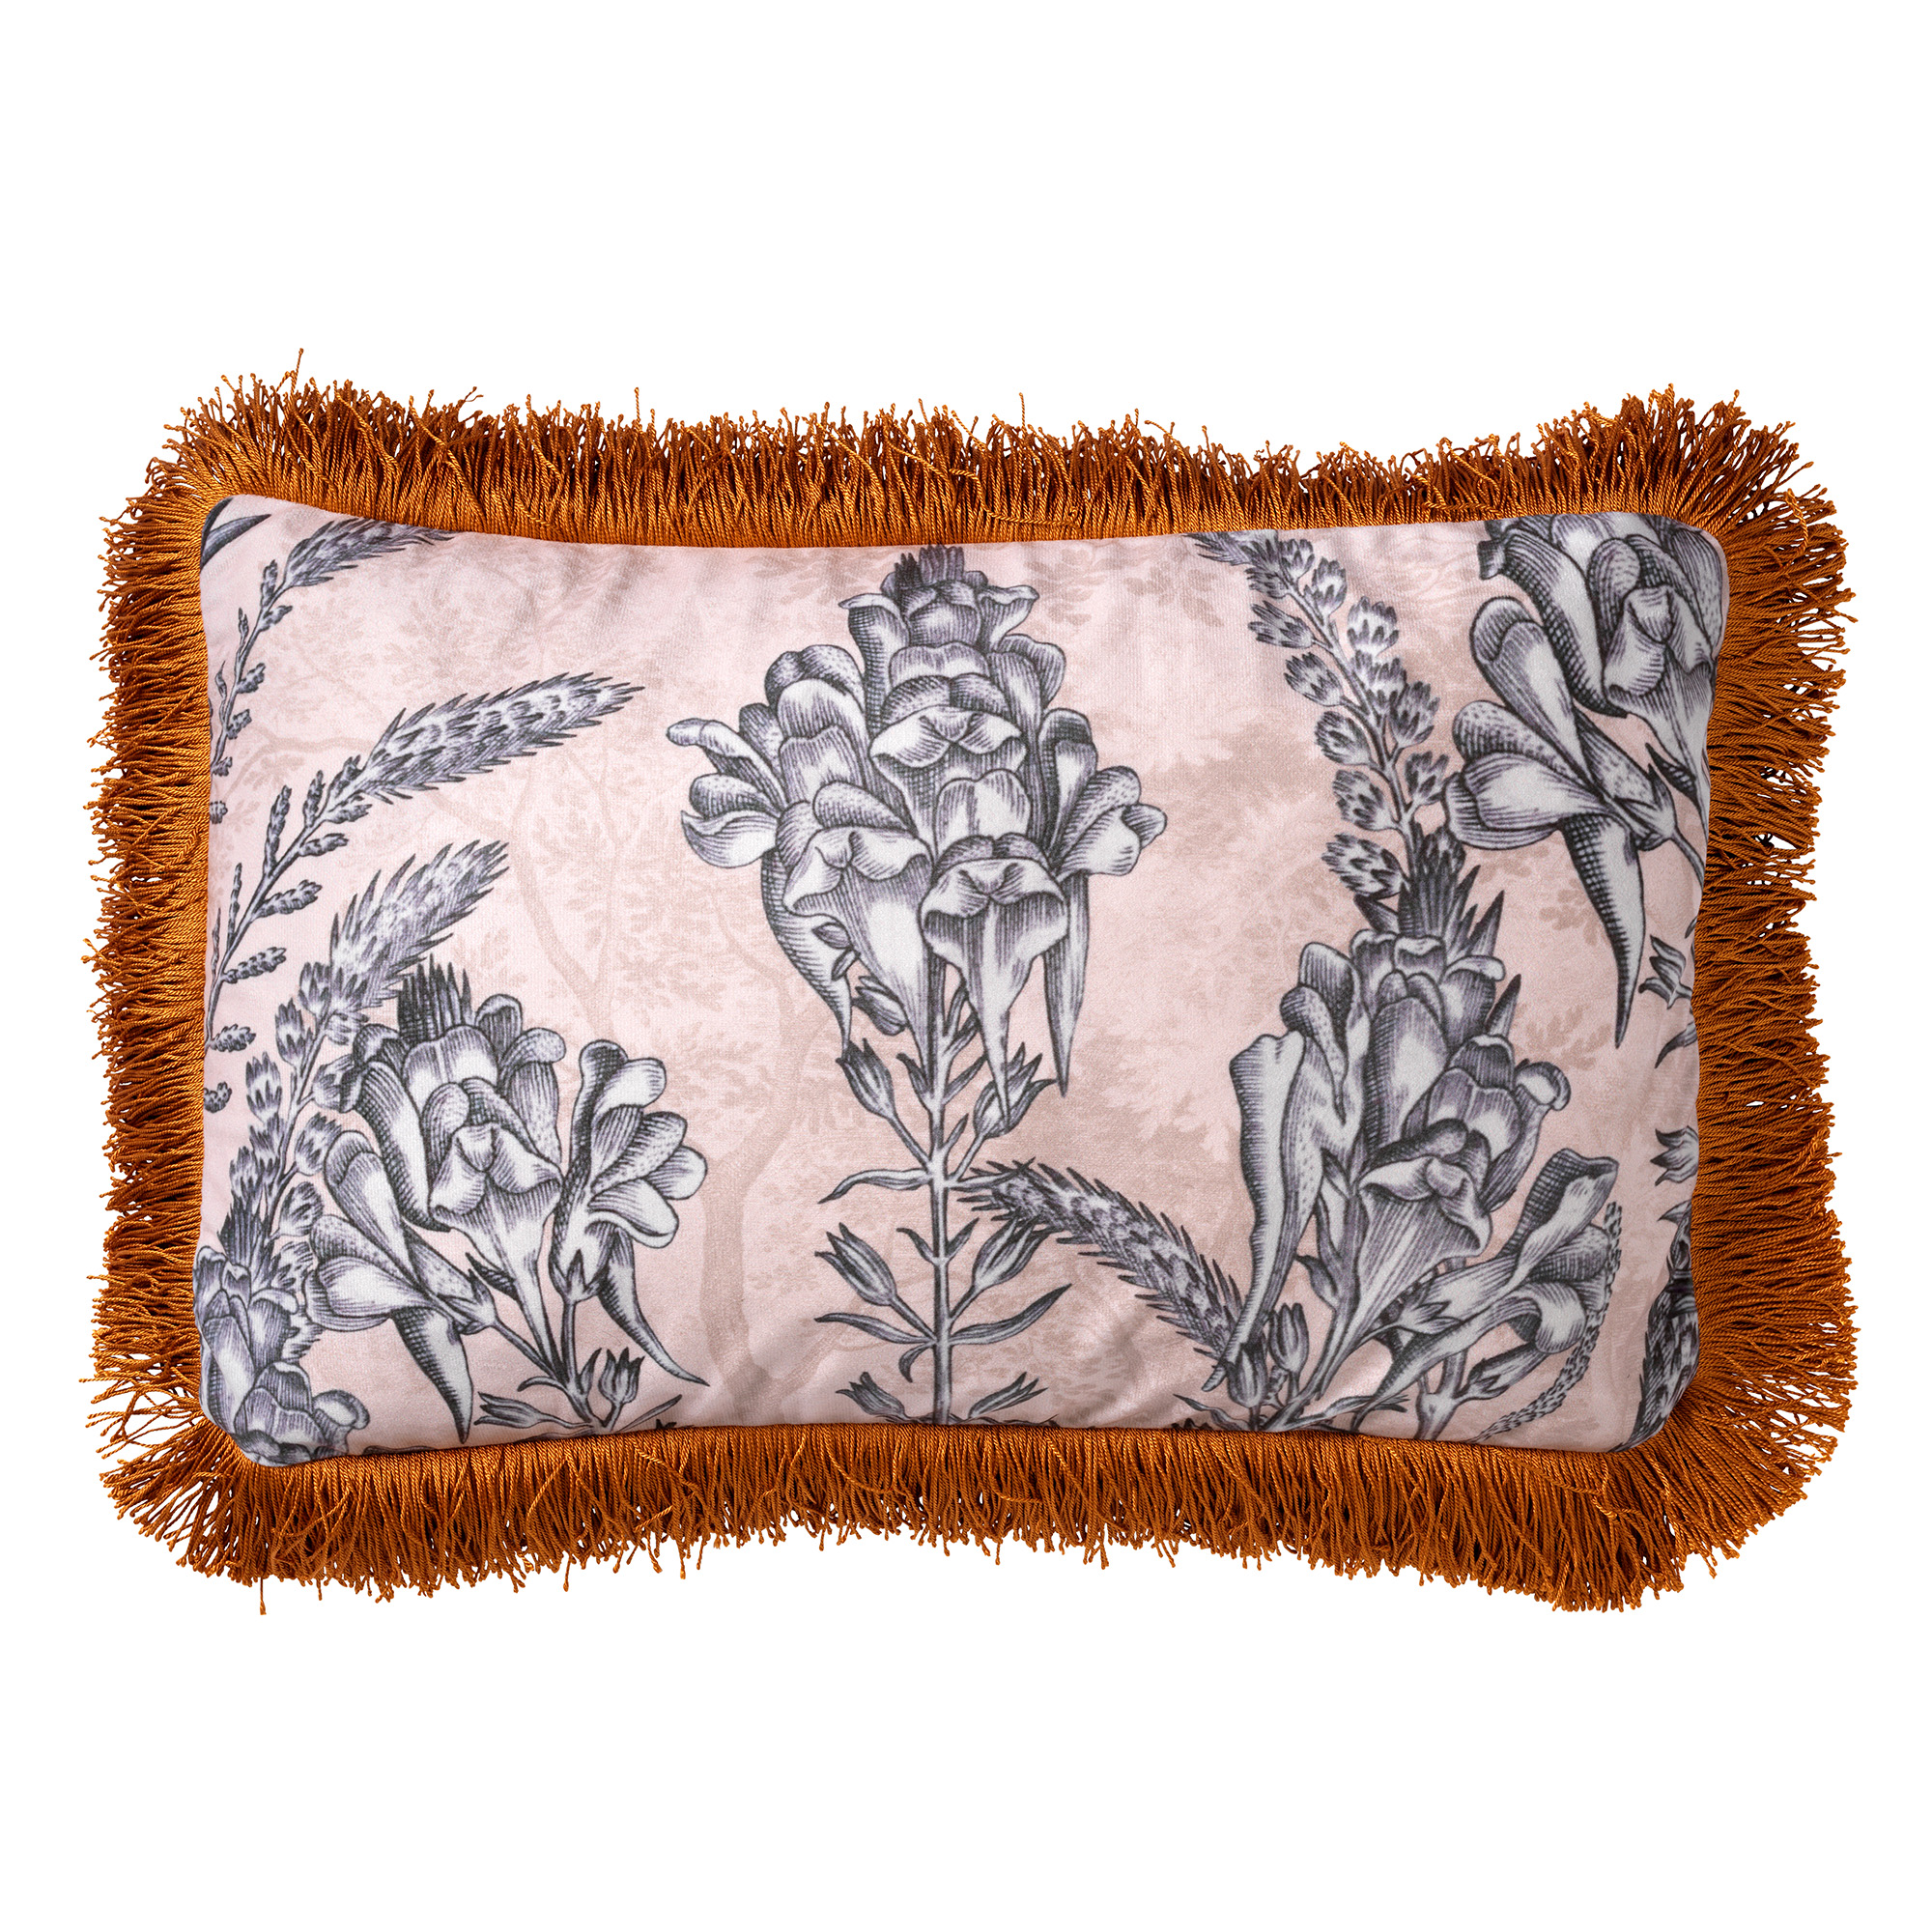 MOTI - Sierkussen met bloemenpatroon 30x50 cm Pumice Stone